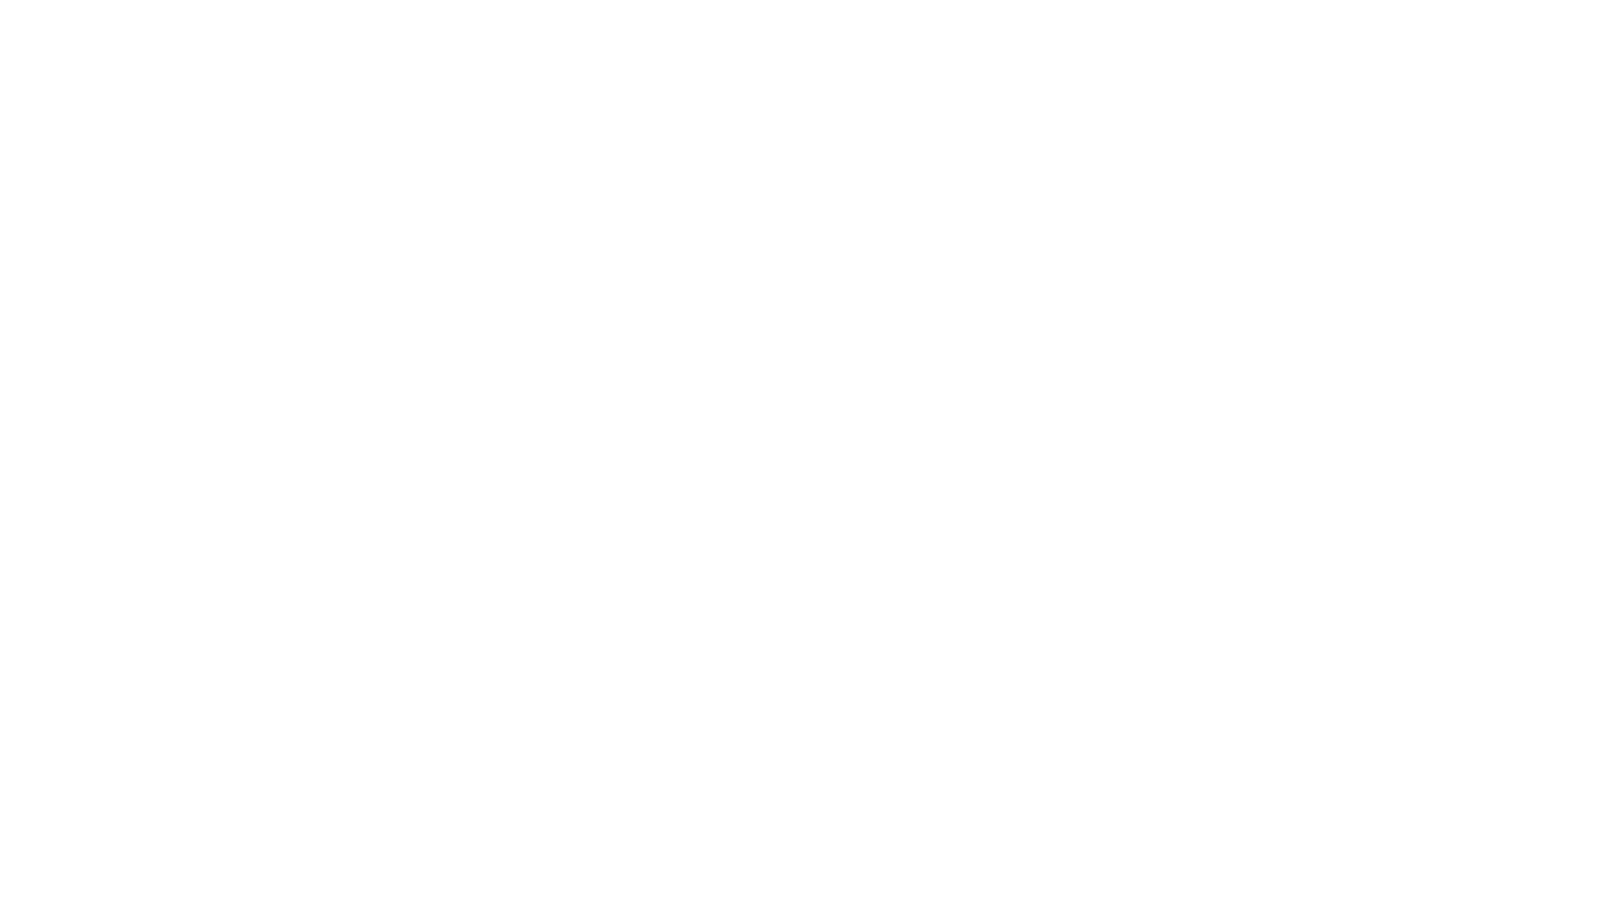 O Devare   ಓ ದೇವರೇ..!!  Cinema blunders, due to which movies with good stories also fail. Written, Directed and Edited by Gireesh C P - Tent Cinema Direction Student Genre: Comedy Drama  Cast: Silver Star Ganesh, Gireesh C P, Sanjay Das, Tejaswini Reddy, Ramachari V Direction Team: Karthik C, Umesh N, Surya H P Music: YouTube, Brain & Hoober